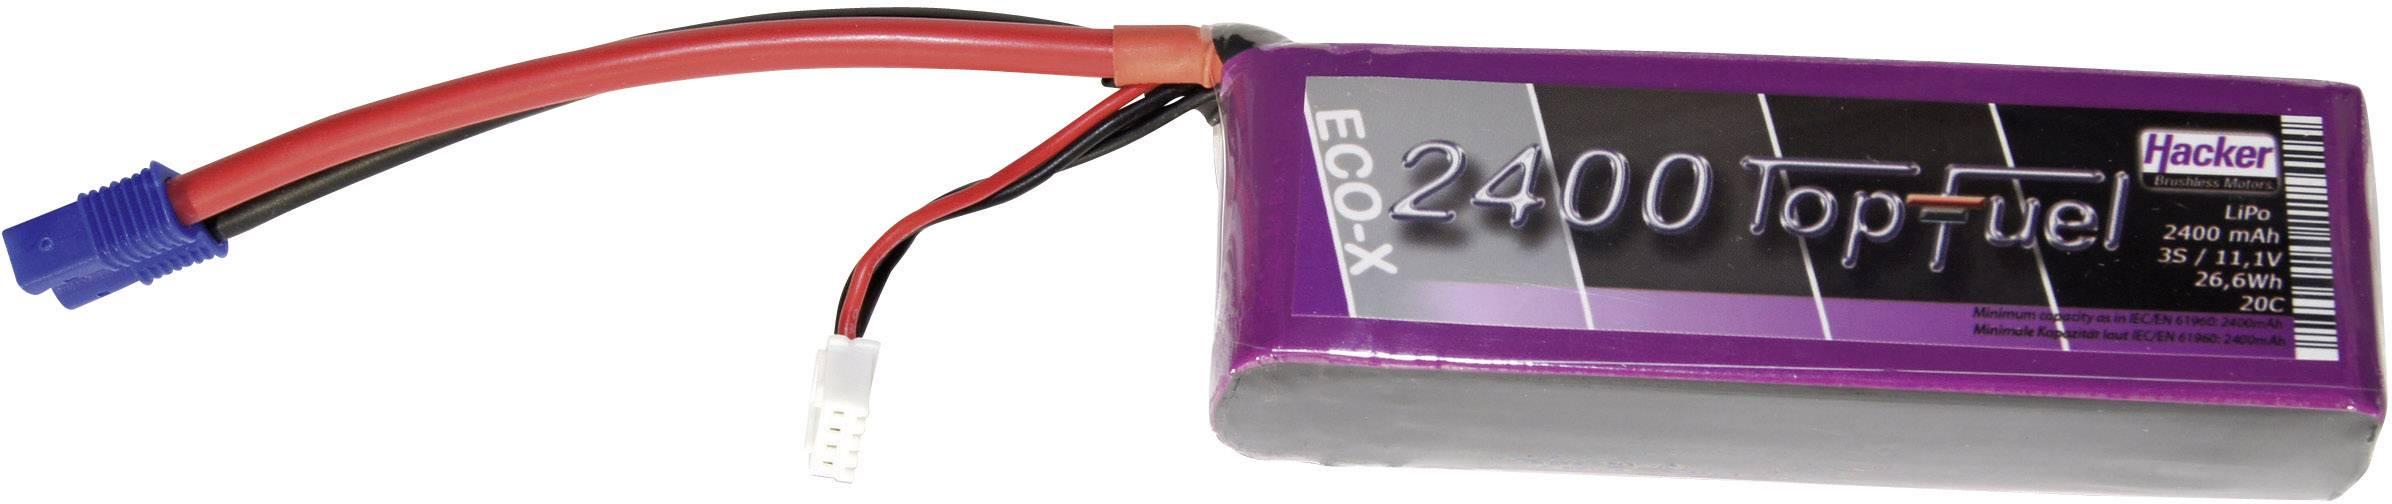 Akupack Li-Pol Hacker 22400331, 11.1 V, 2400 mAh